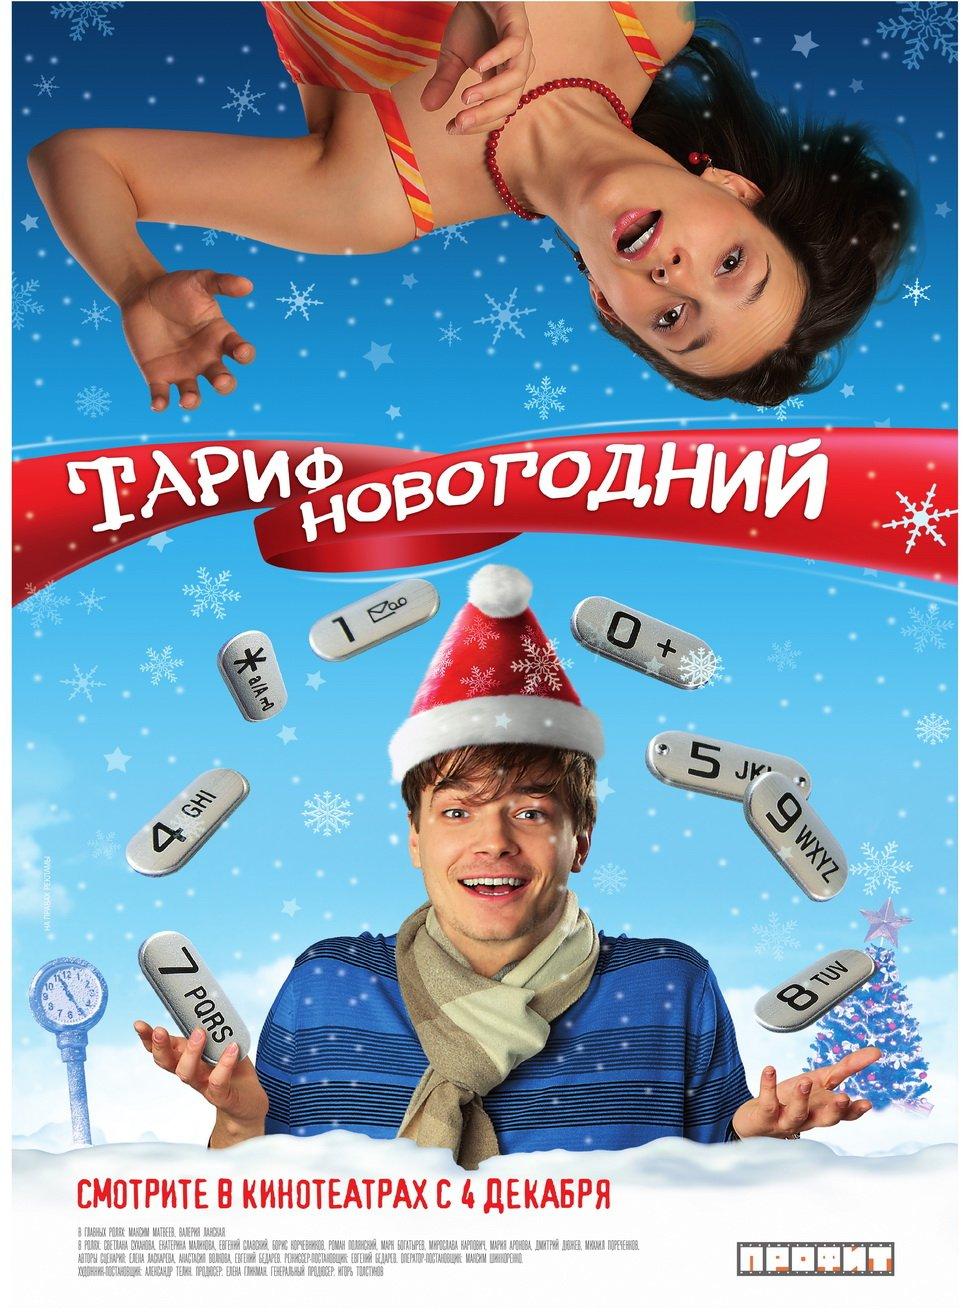 Alexander Porokhovshchikov demands to bring his wife to the hospital 11.03.2012 42